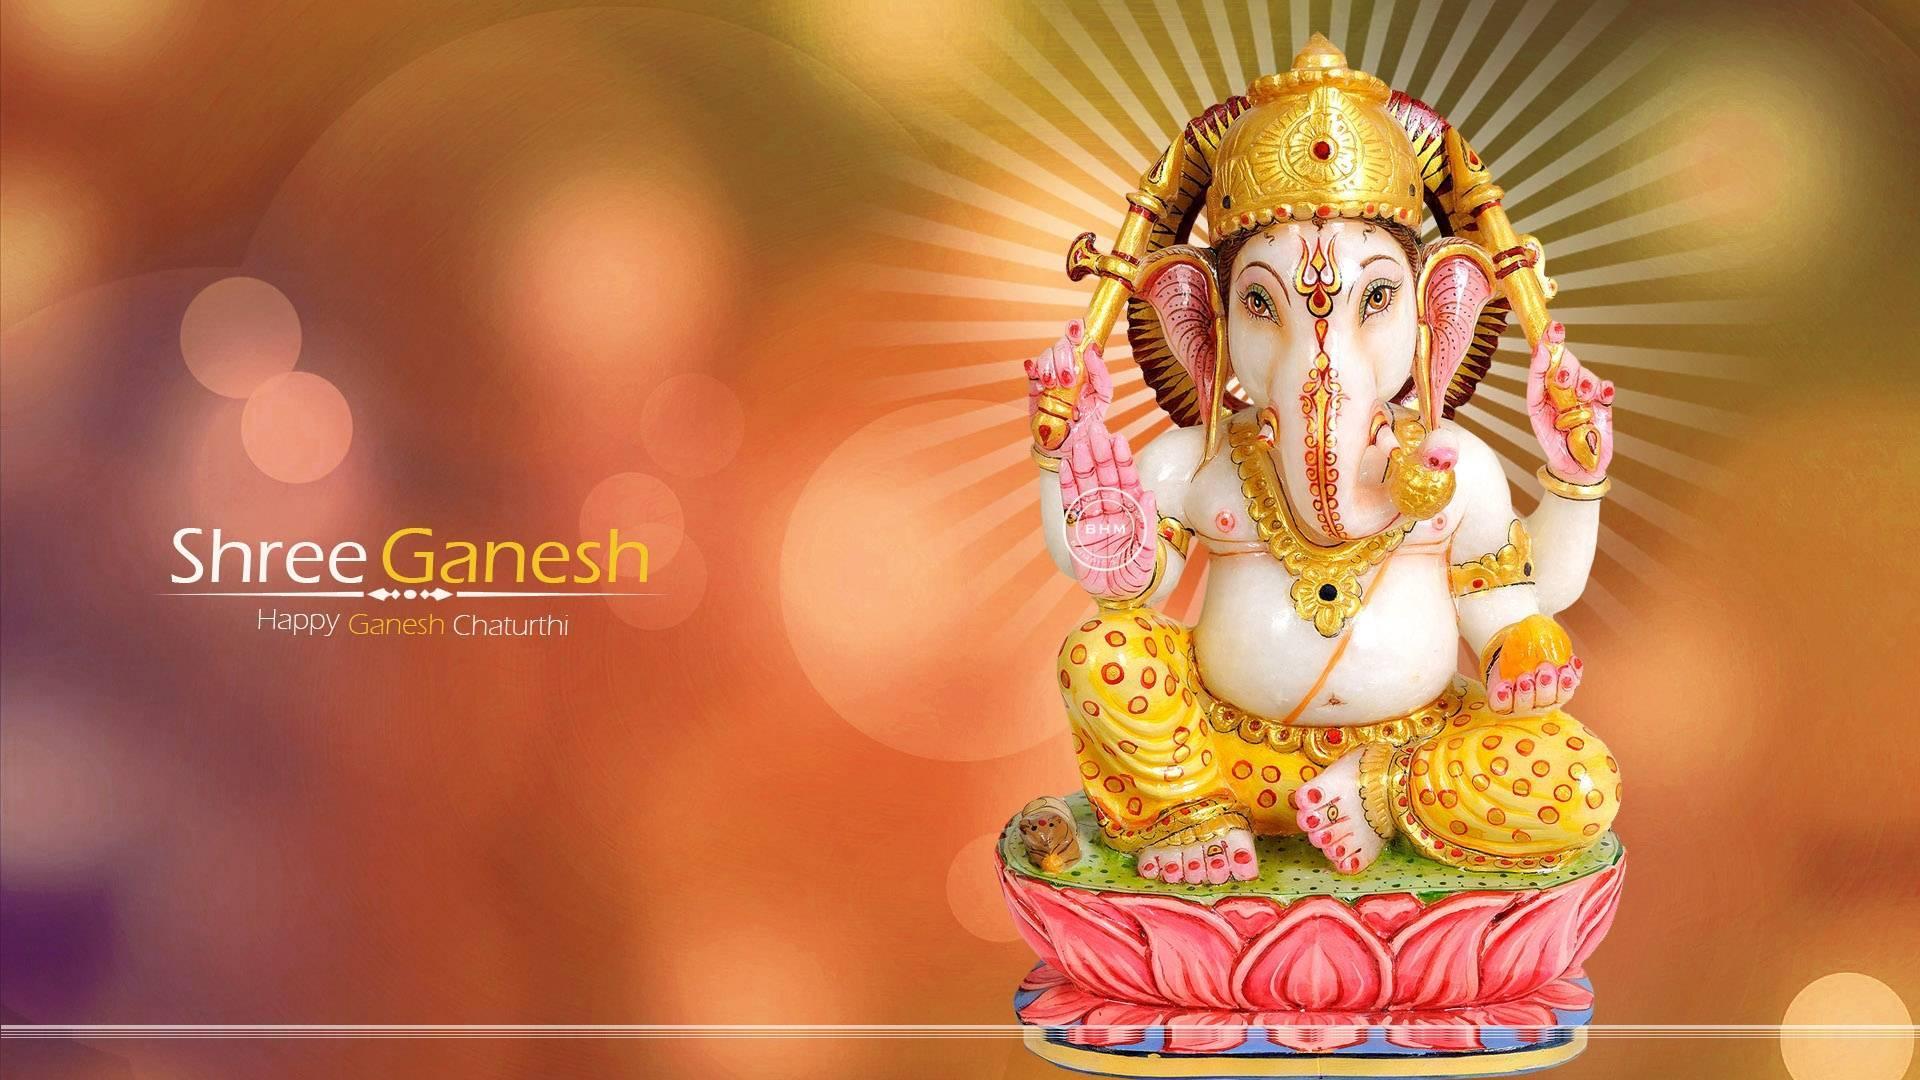 Ganesh Chaturthi Cute Ganesha Images Hd